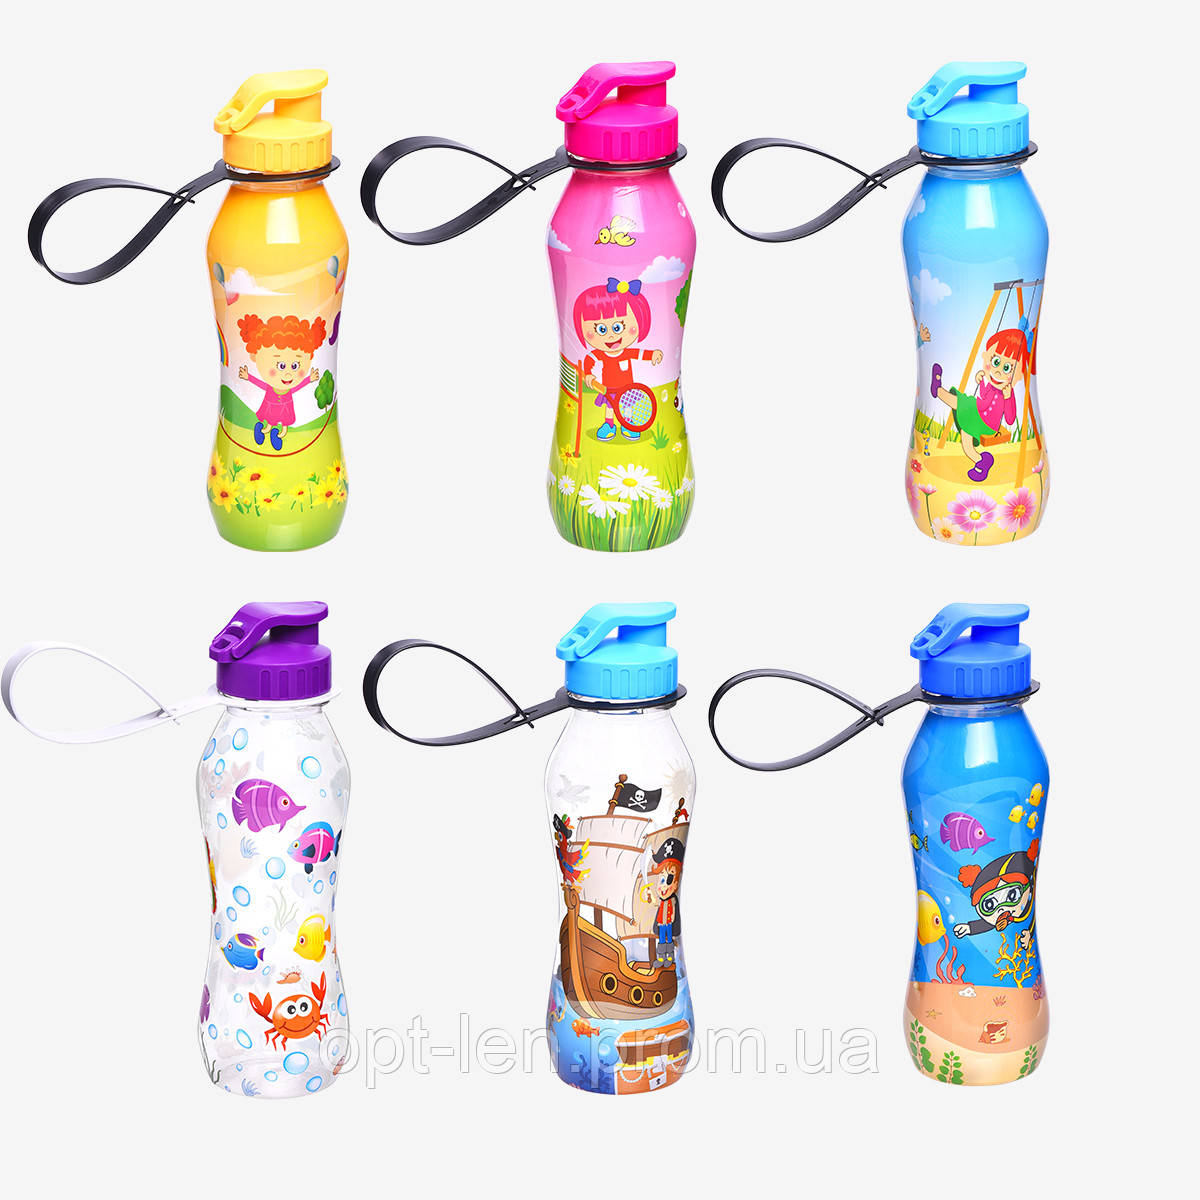 CM-765 Бутылка для воды 0,5